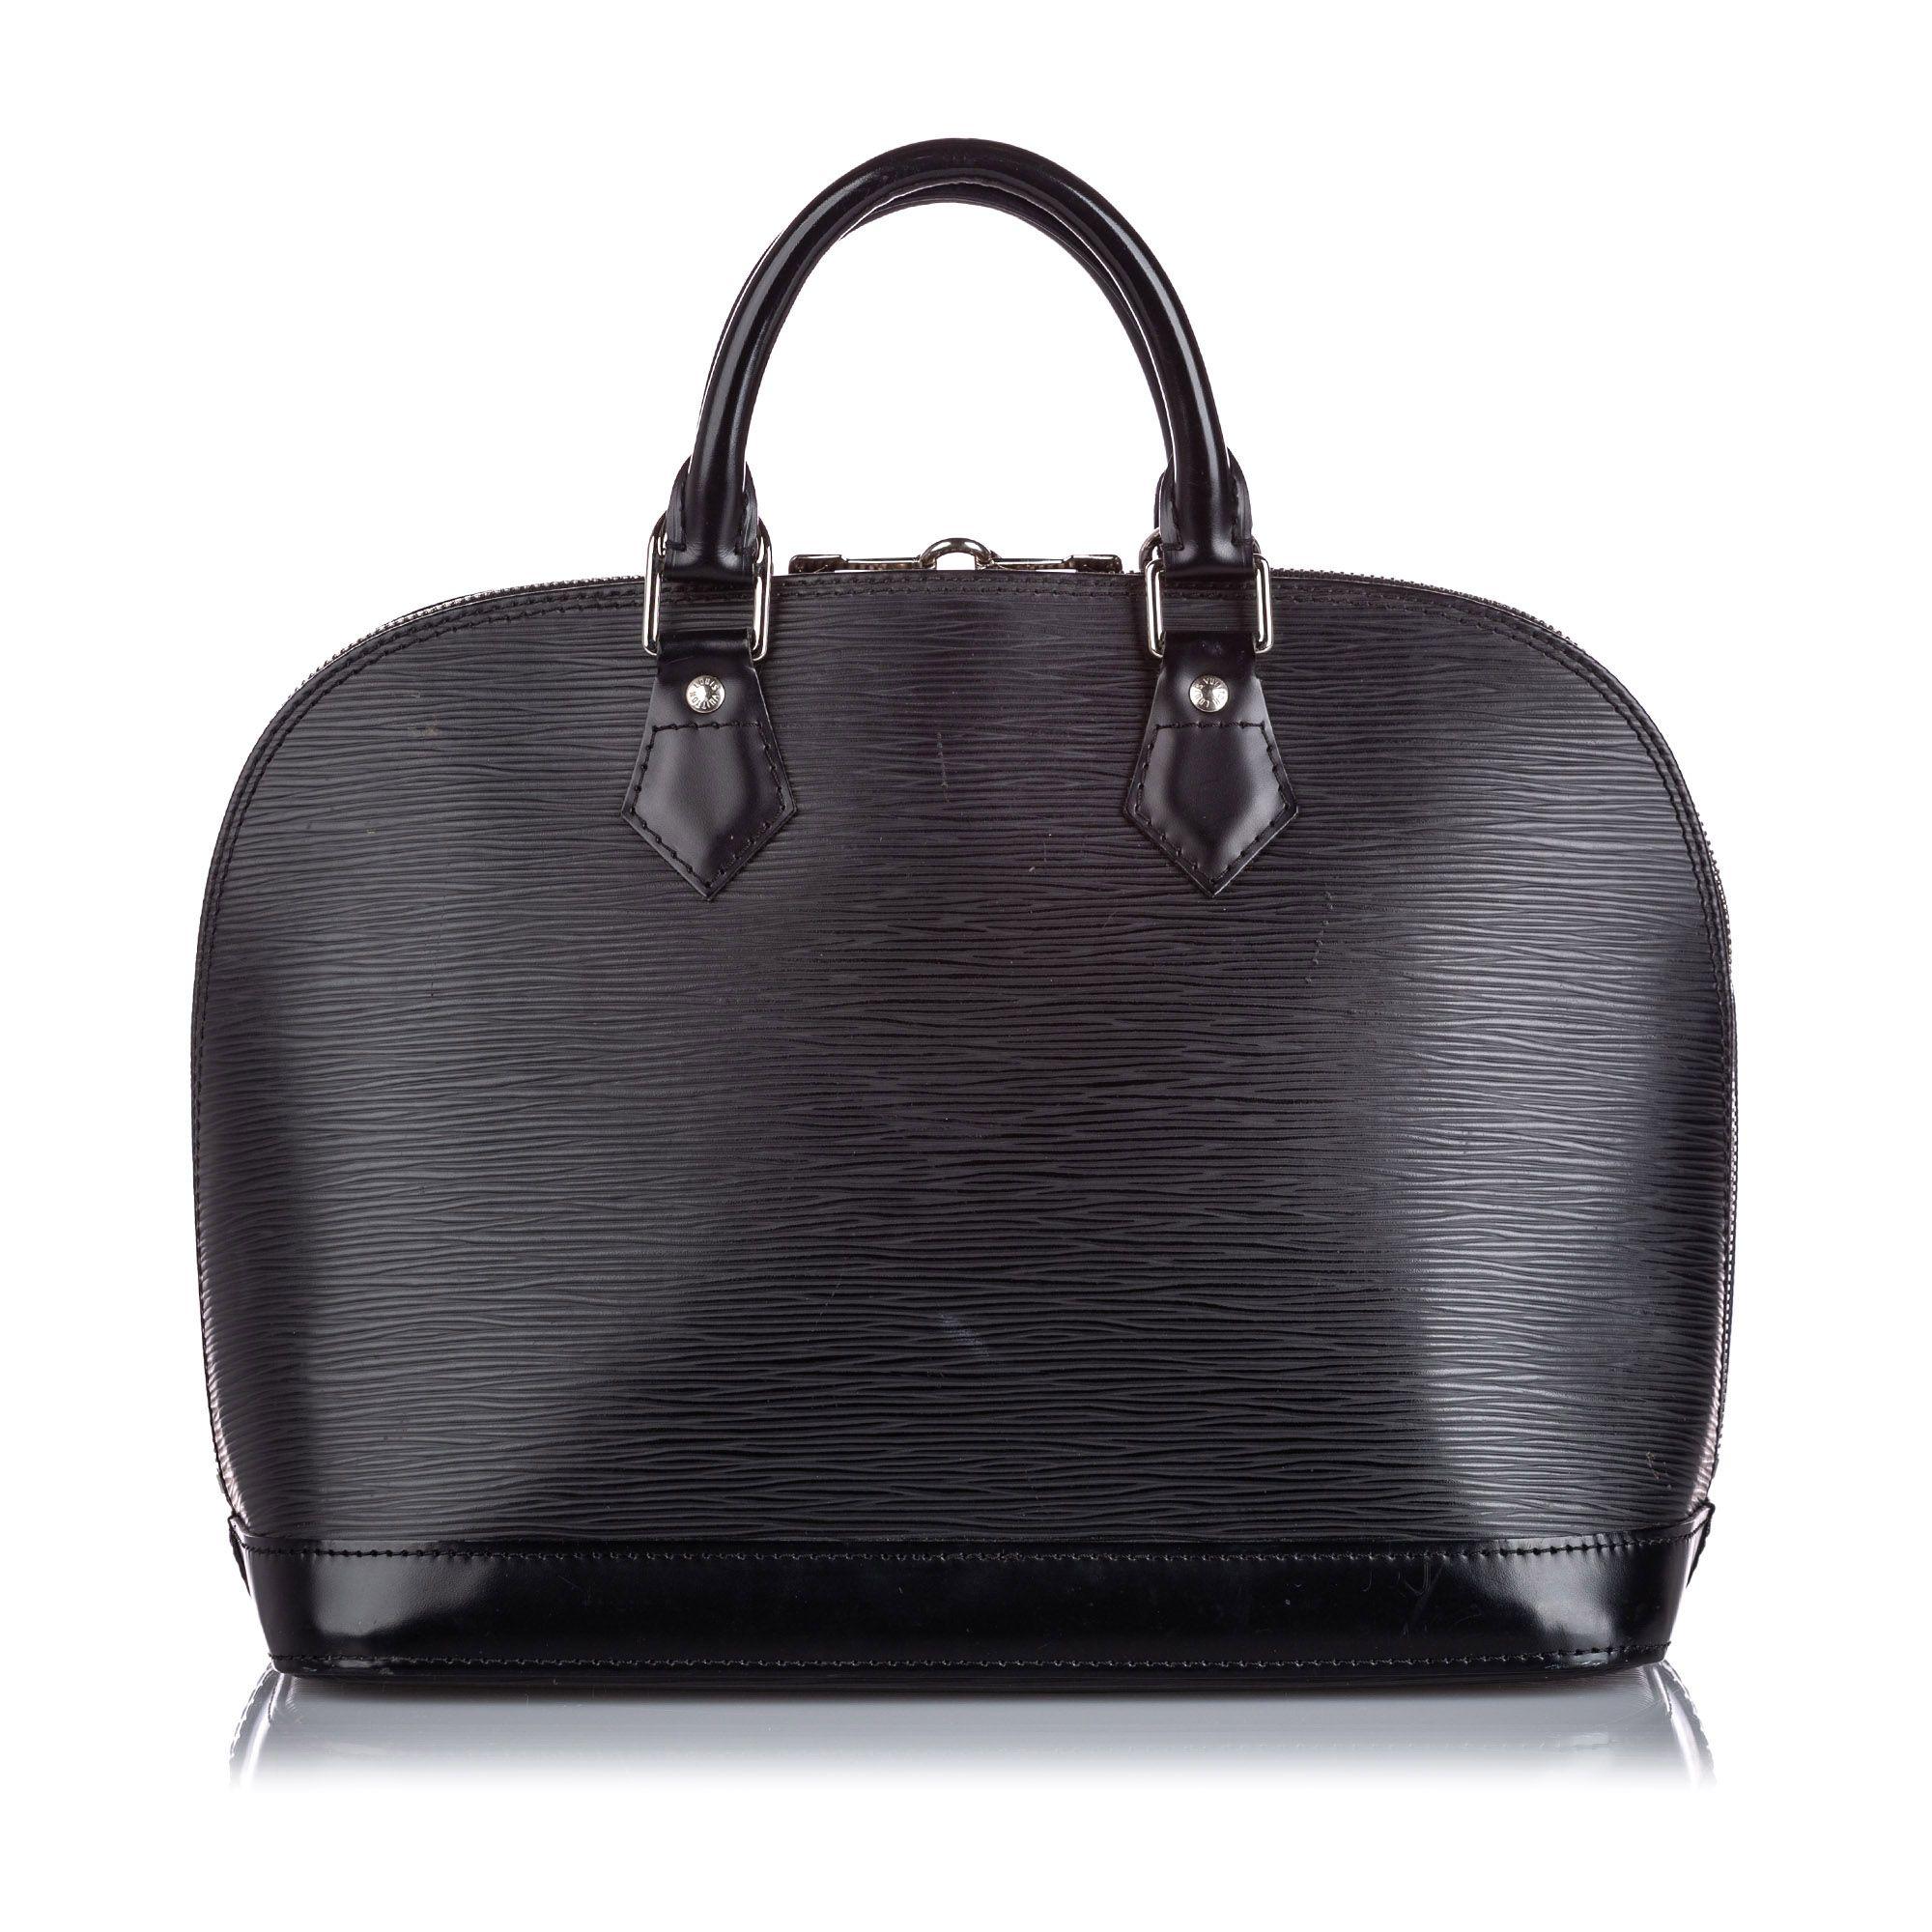 Vintage Louis Vuitton Epi Alma PM Black